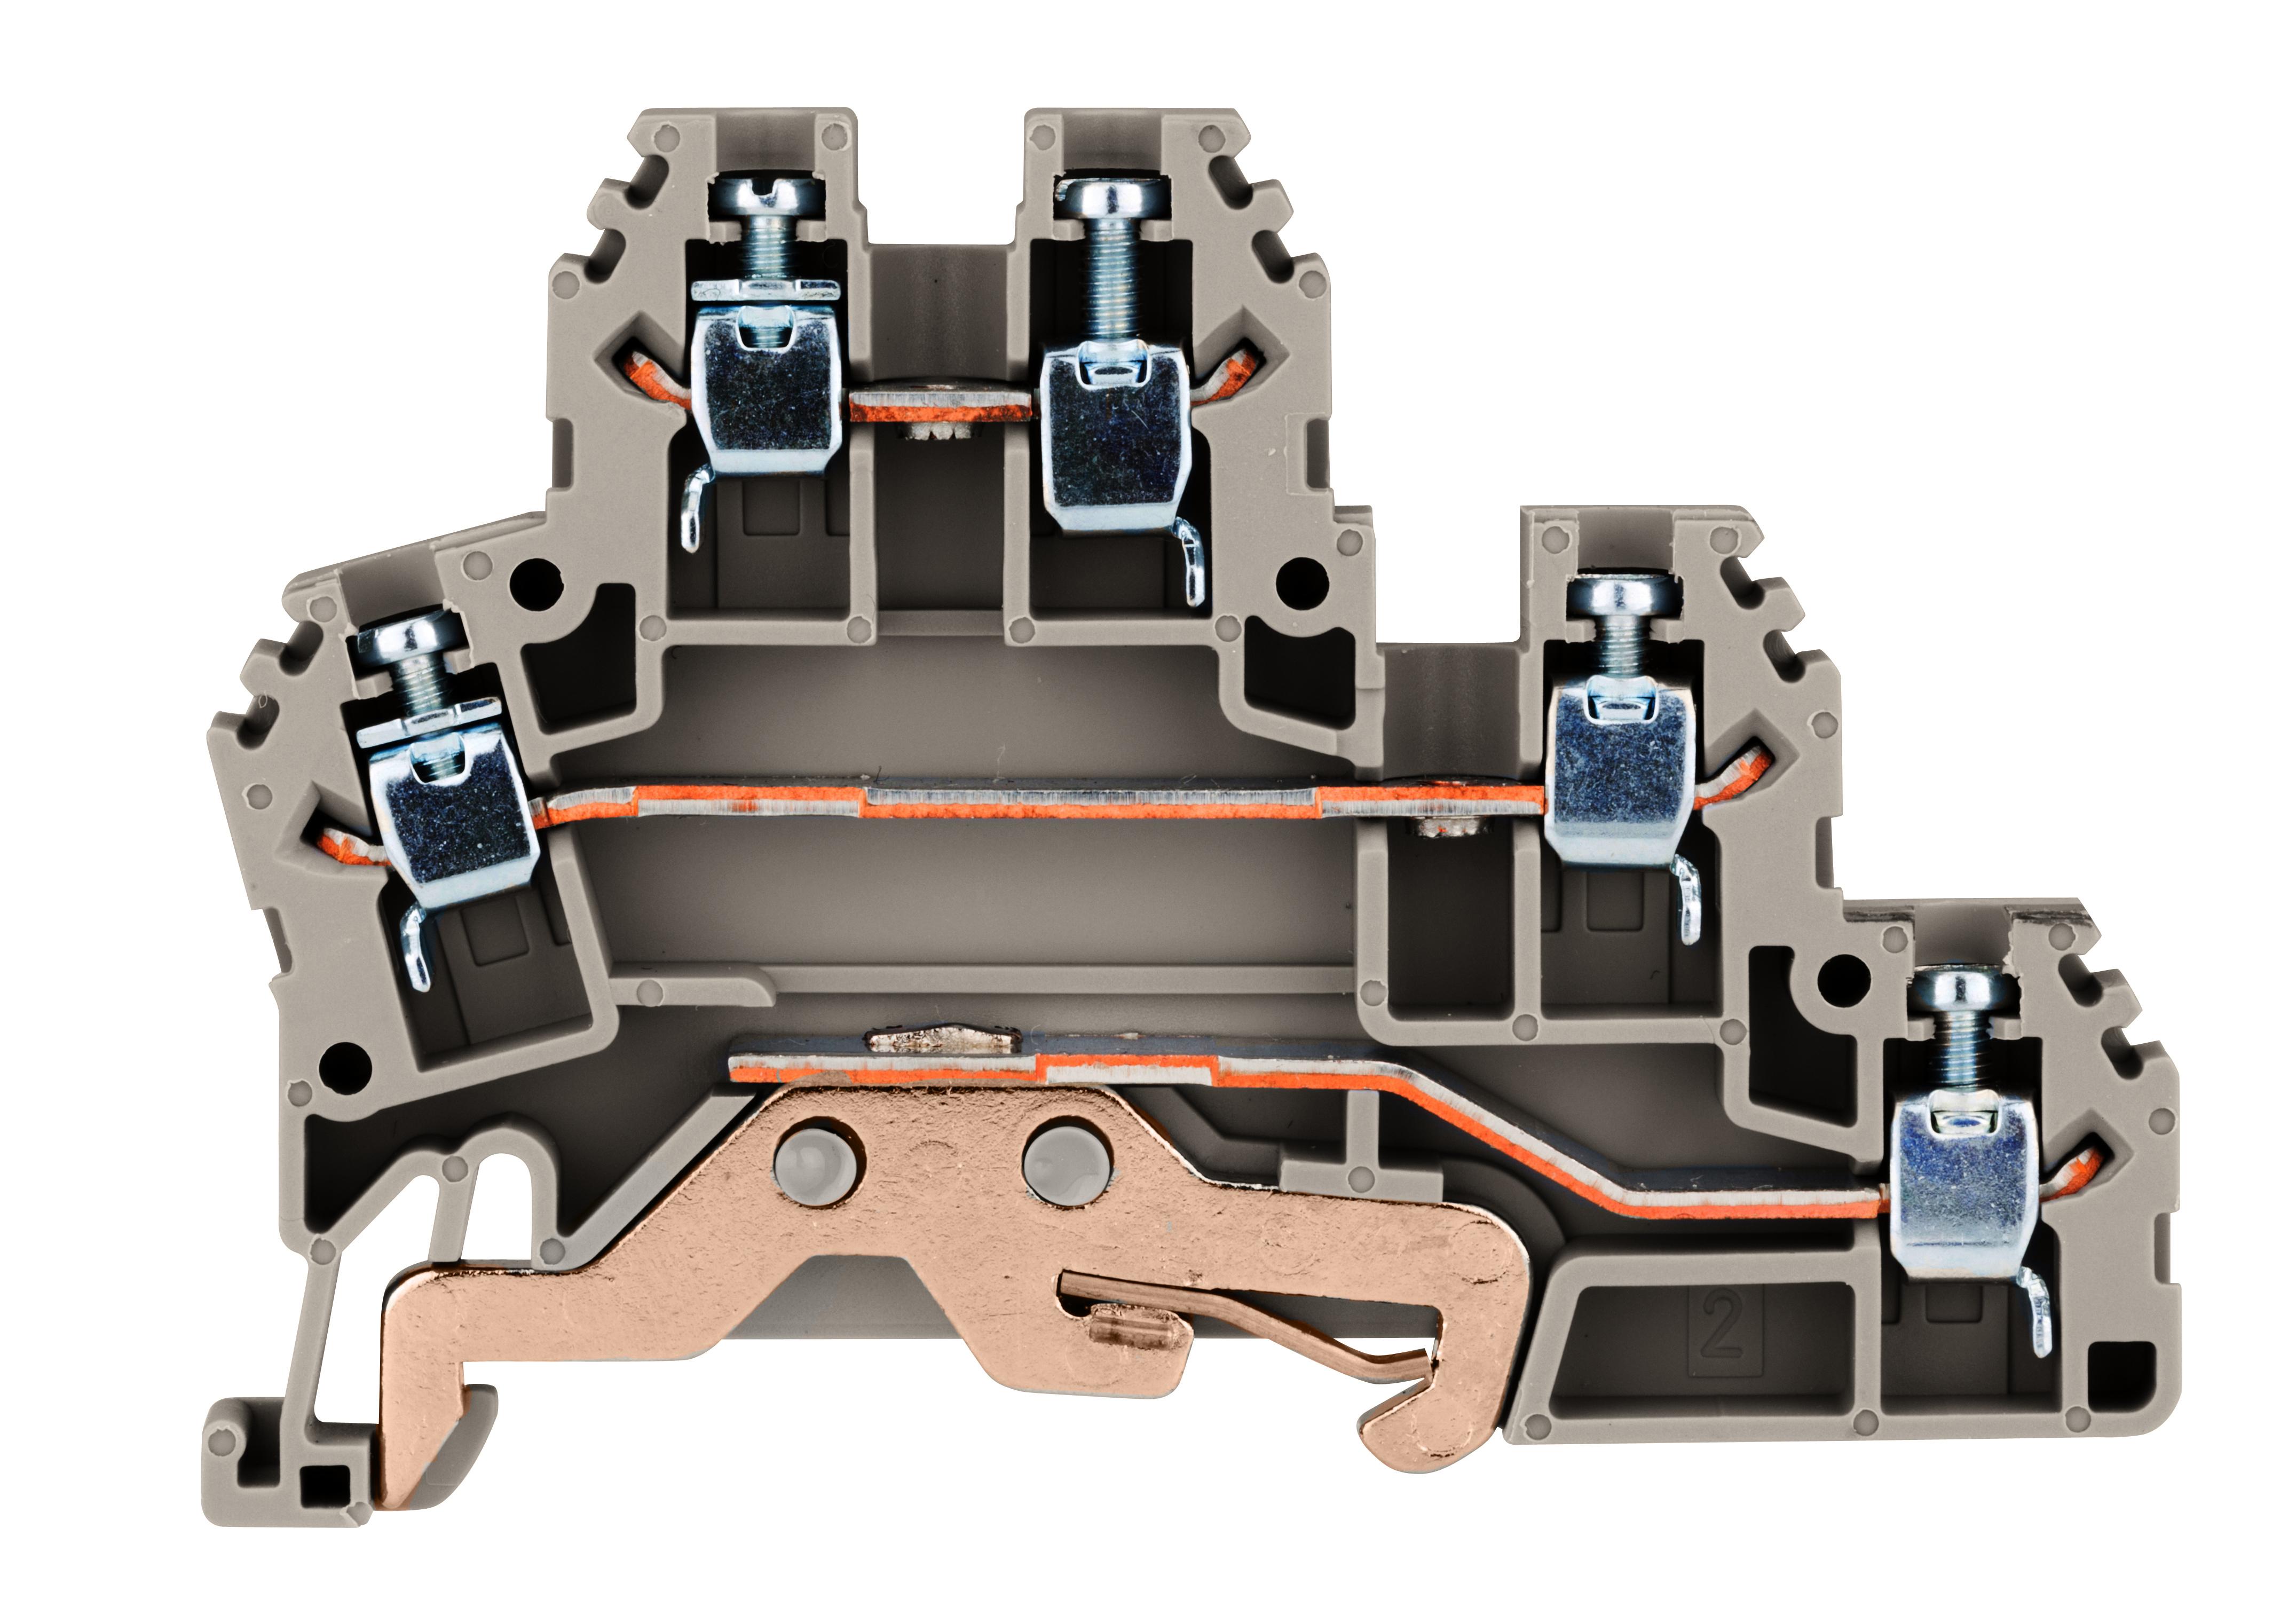 1 Stk Installations-Dreistockklemme 2,5mm², Type PUK2T, L/L/PE IK680004--